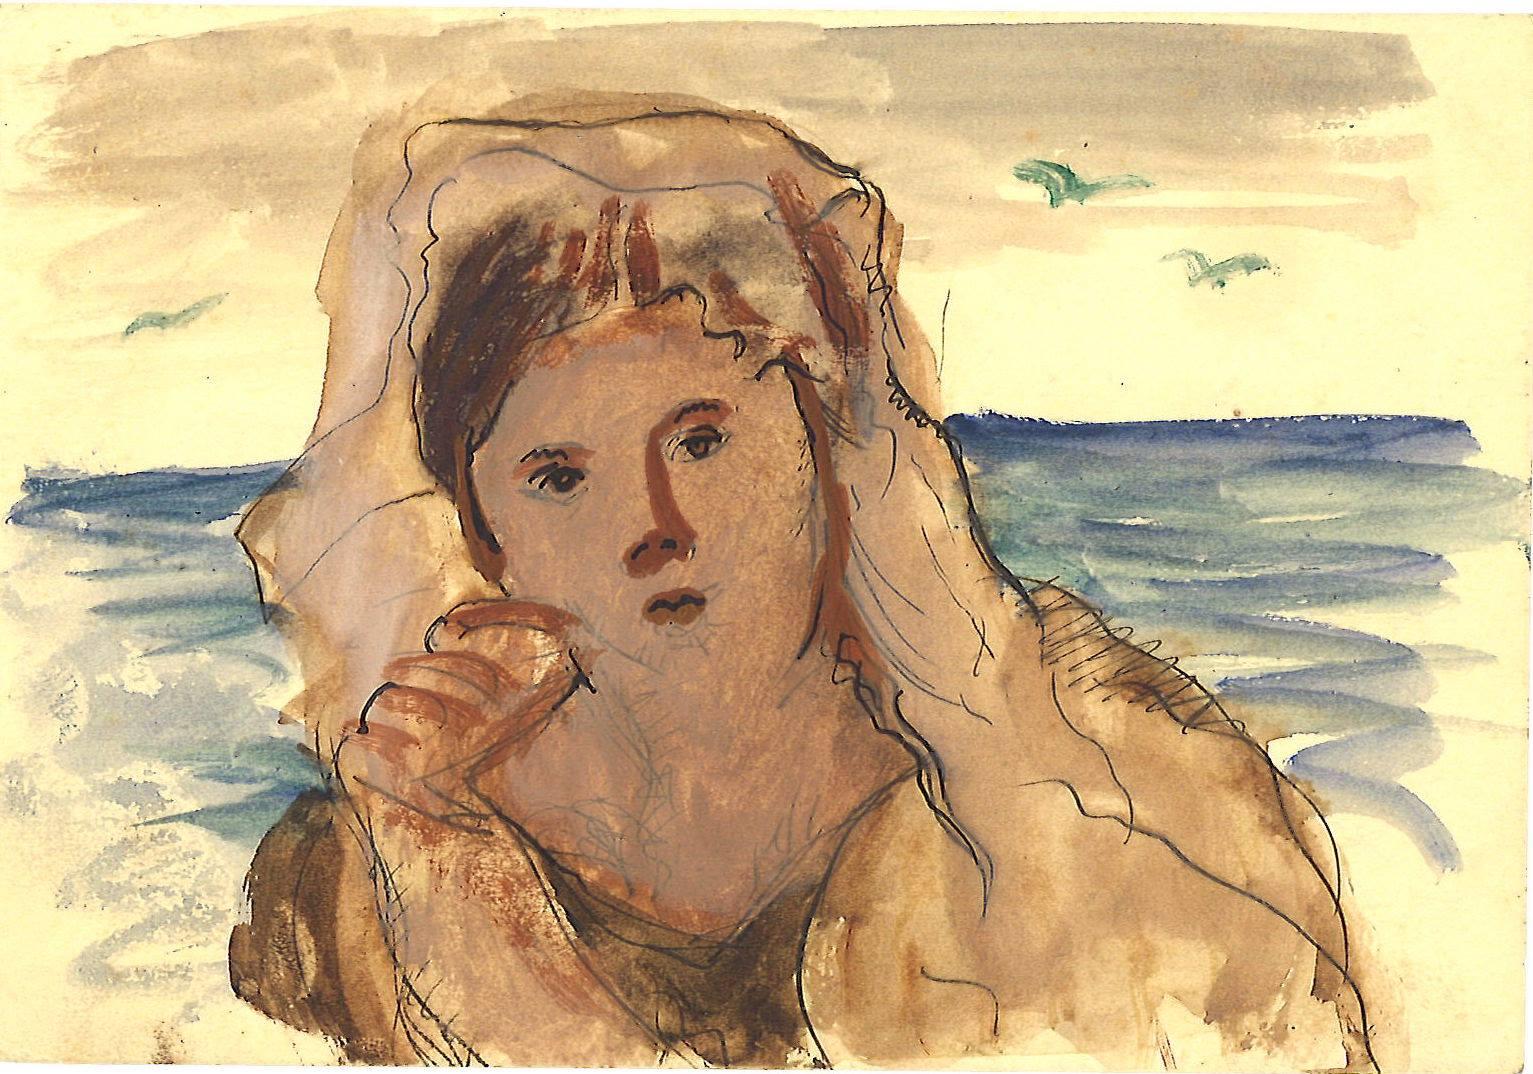 Giuseppe Capogrossi, Studio di donna con velo, 1931, circa penna e acquerello su carta, cm 9x13